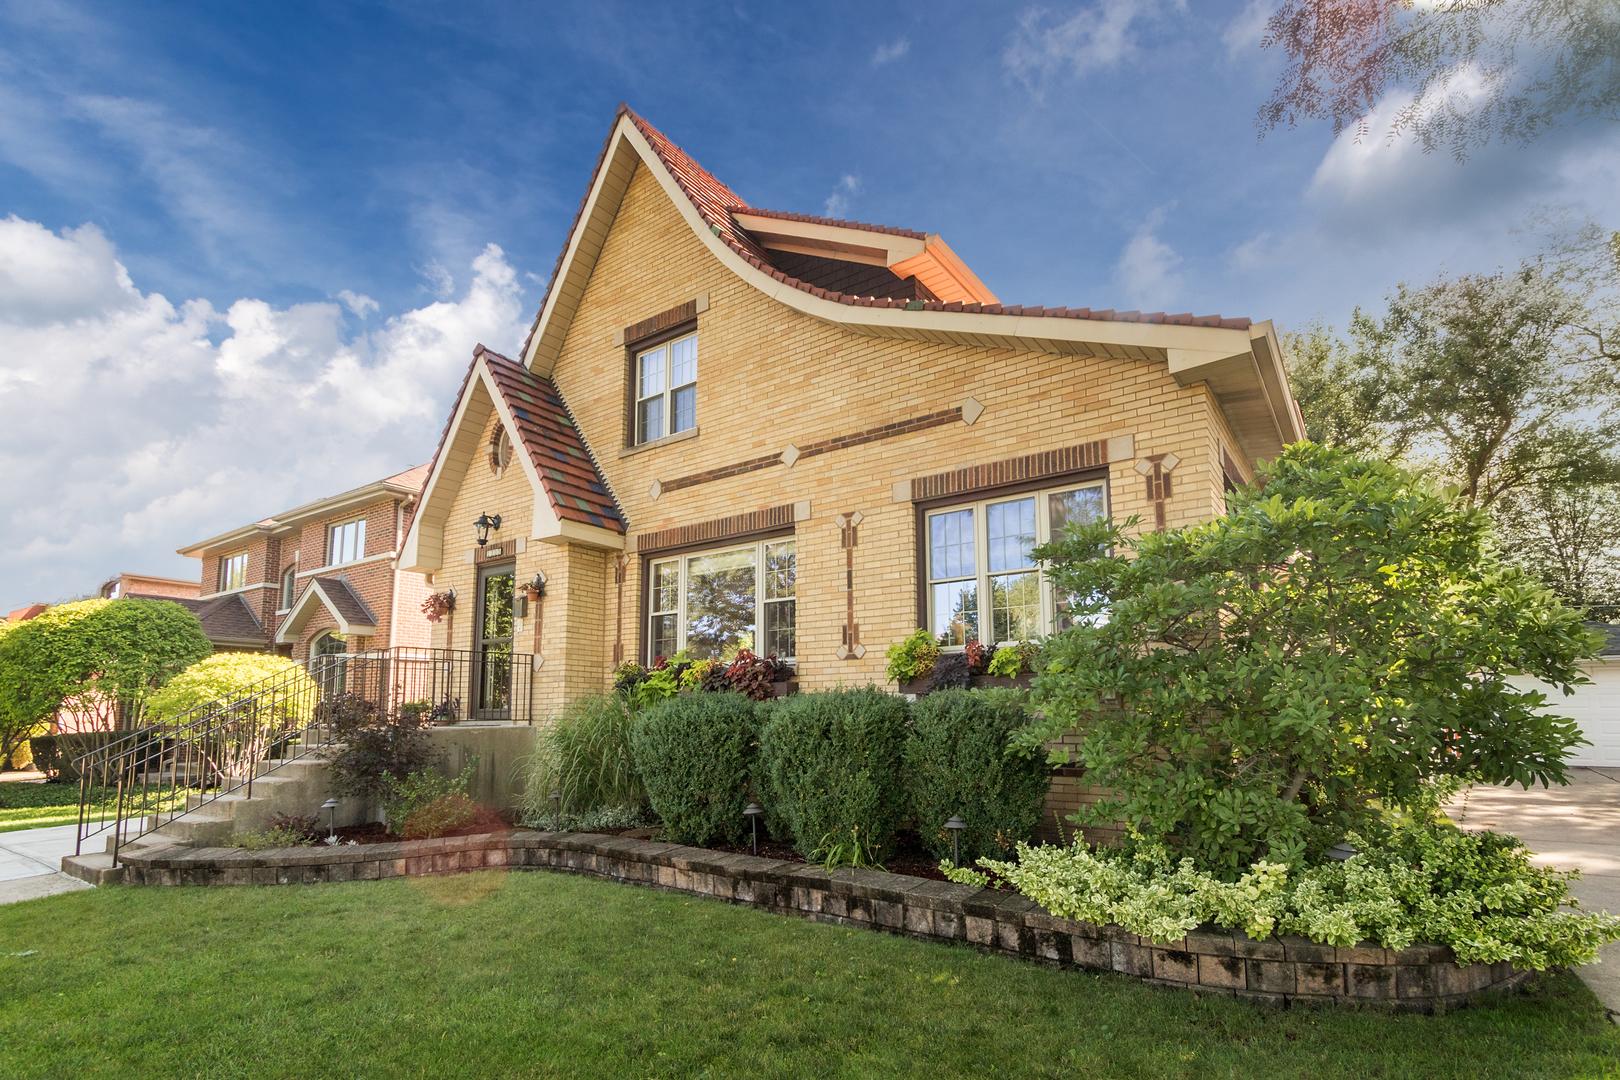 1305 Courtland Avenue, Park Ridge in Cook County, IL 60068 Home for Sale